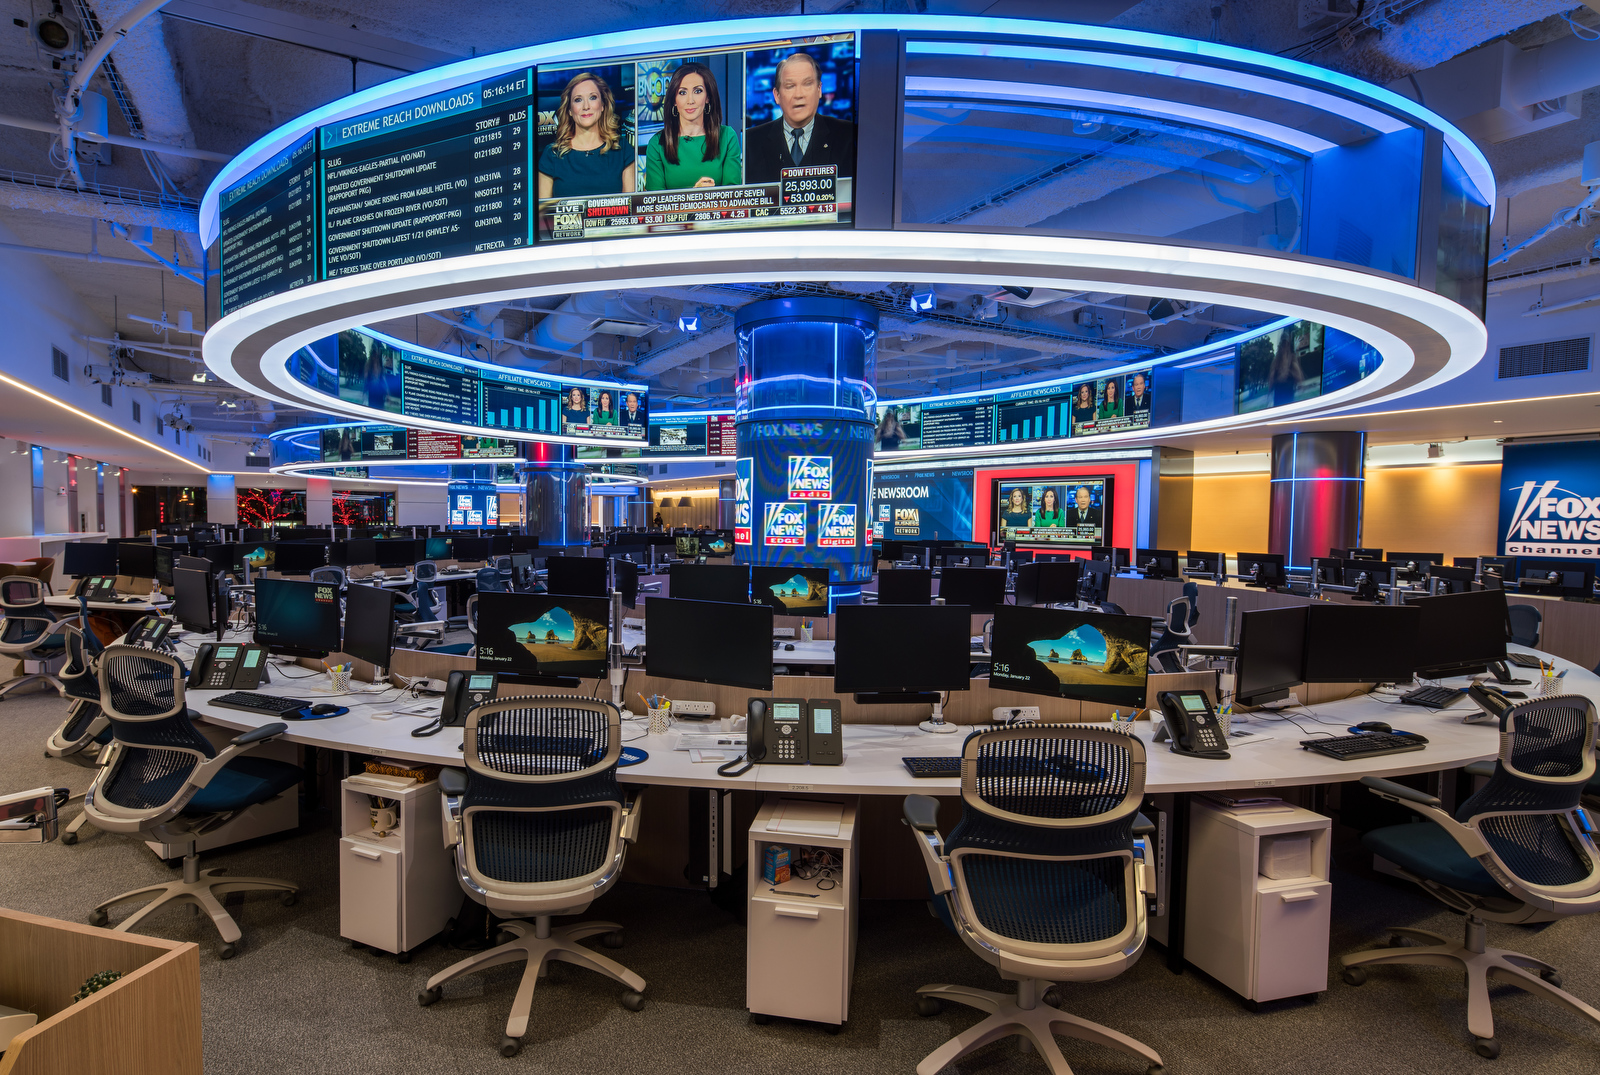 NCS_Fox-News-Newsroom-Studio-N_0008